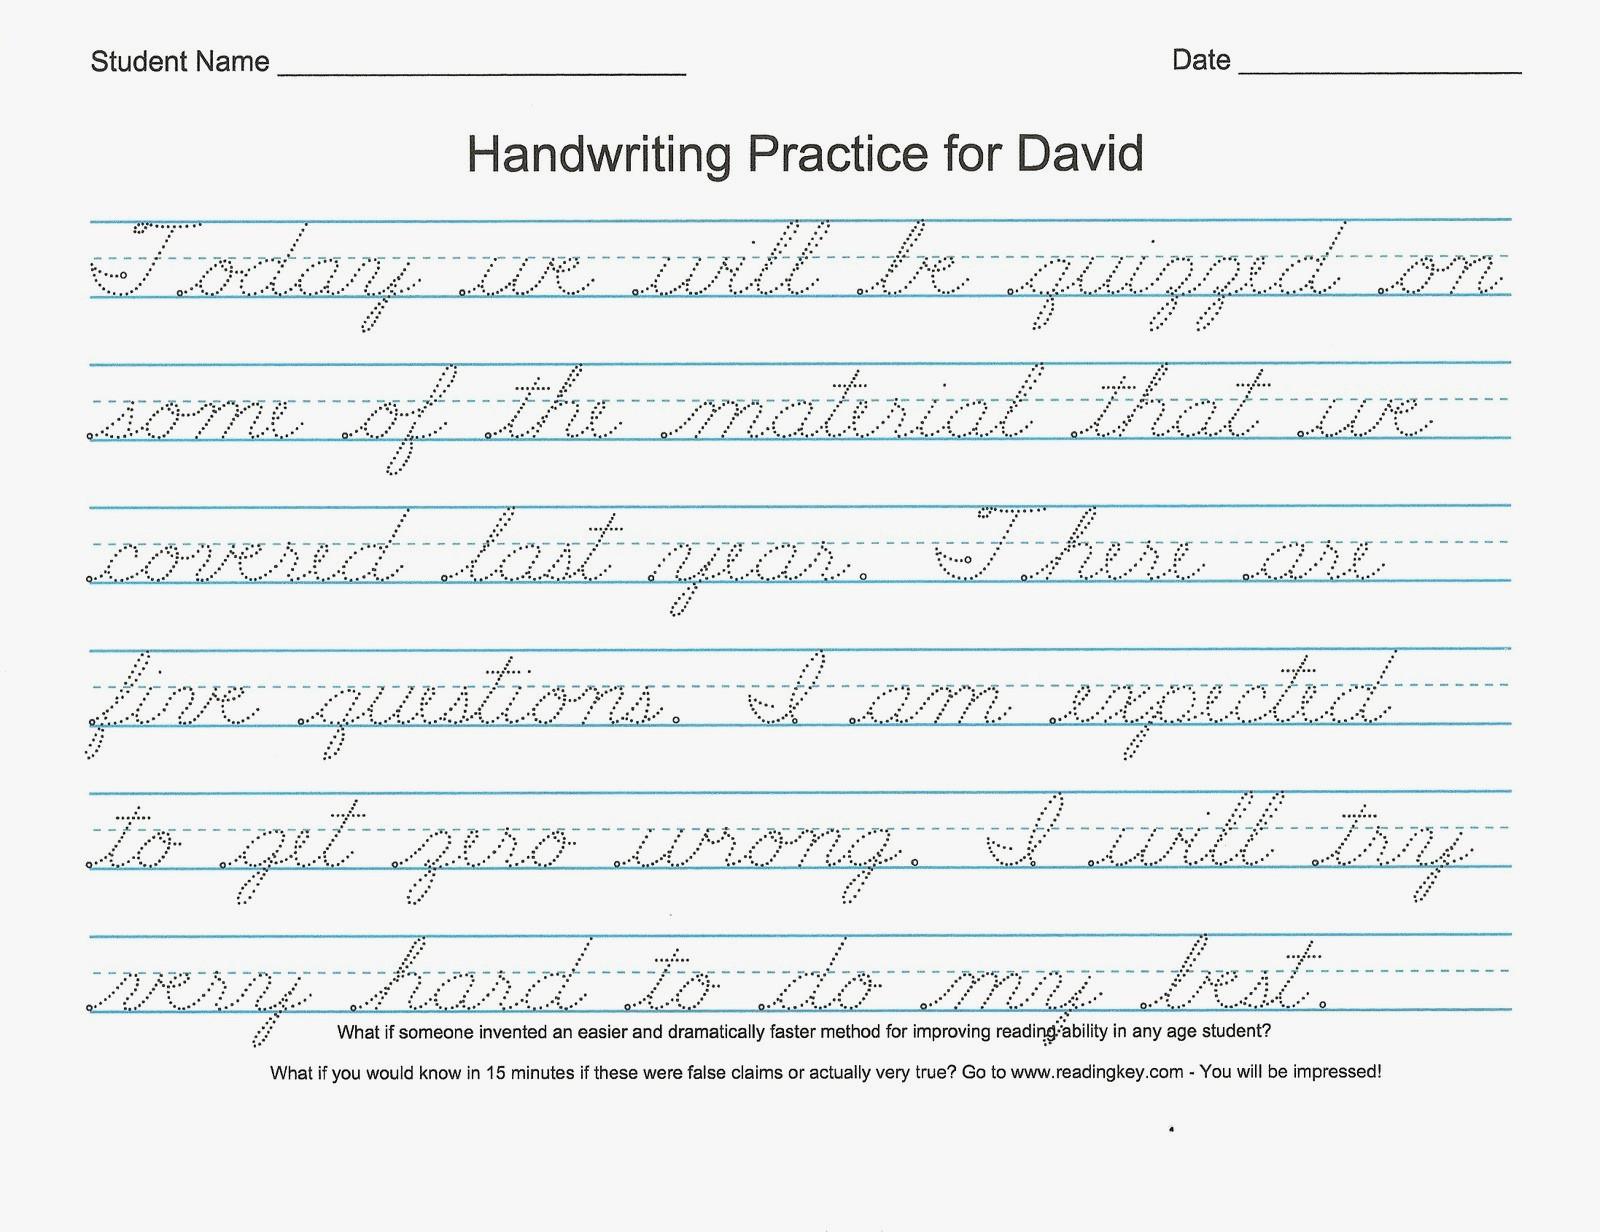 54 Unique Of Free Printable Cursive Handwriting Worksheets Pic | Free Printable Cursive Writing Sentences Worksheets